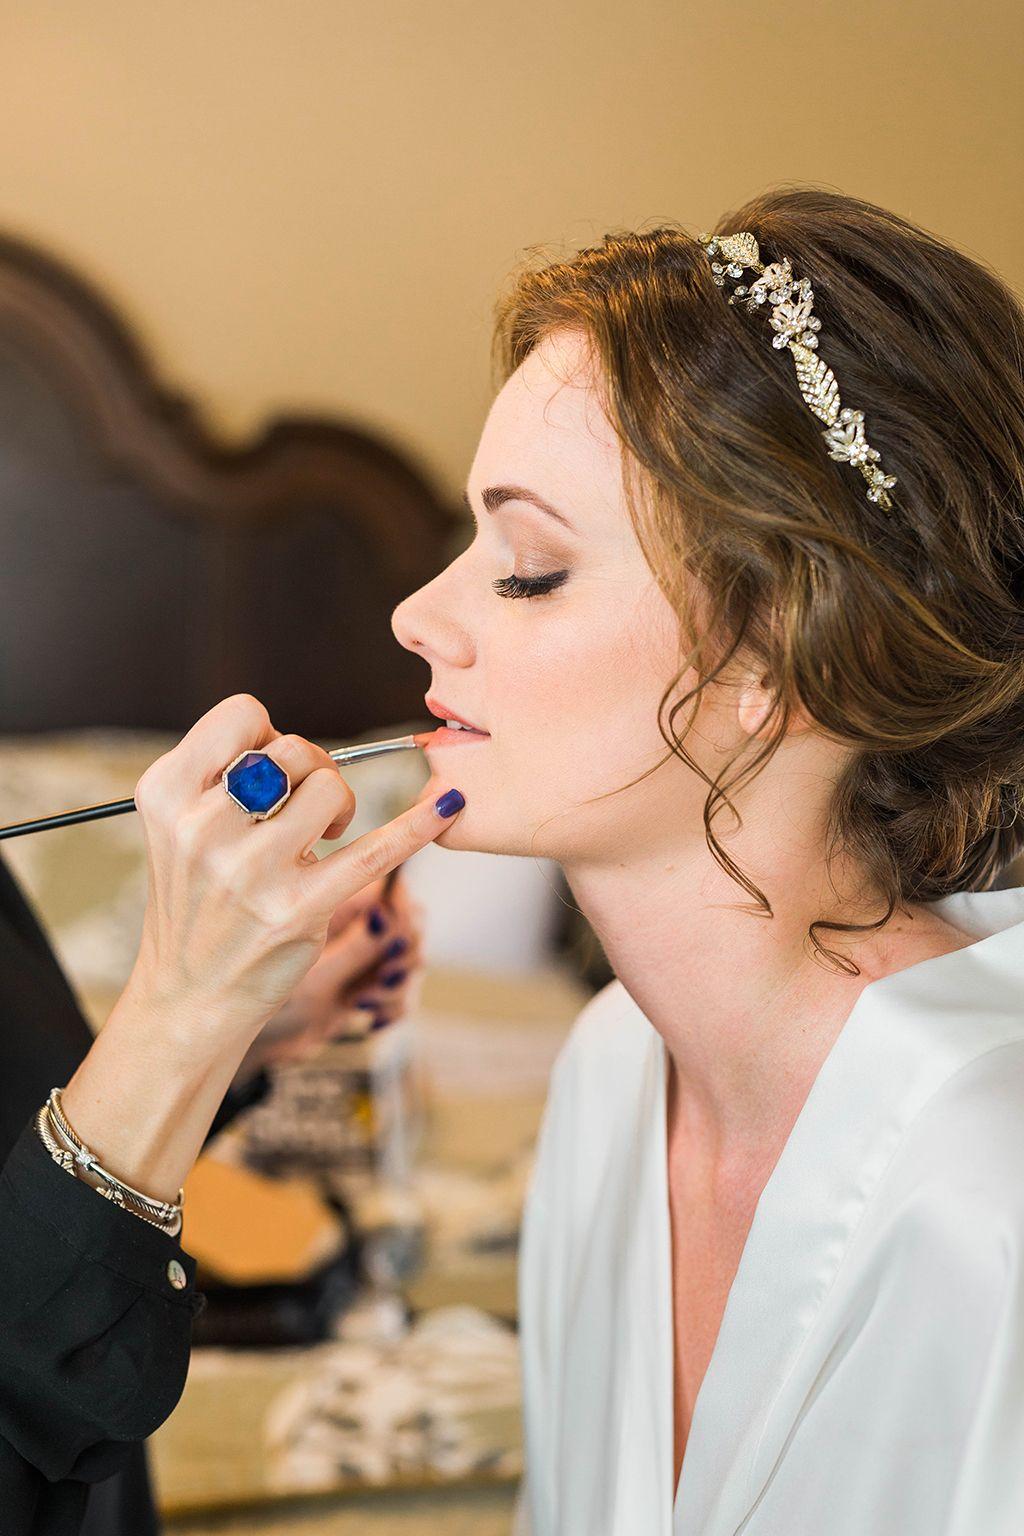 bridal make-up, bride getting ready, bridal details, bridal